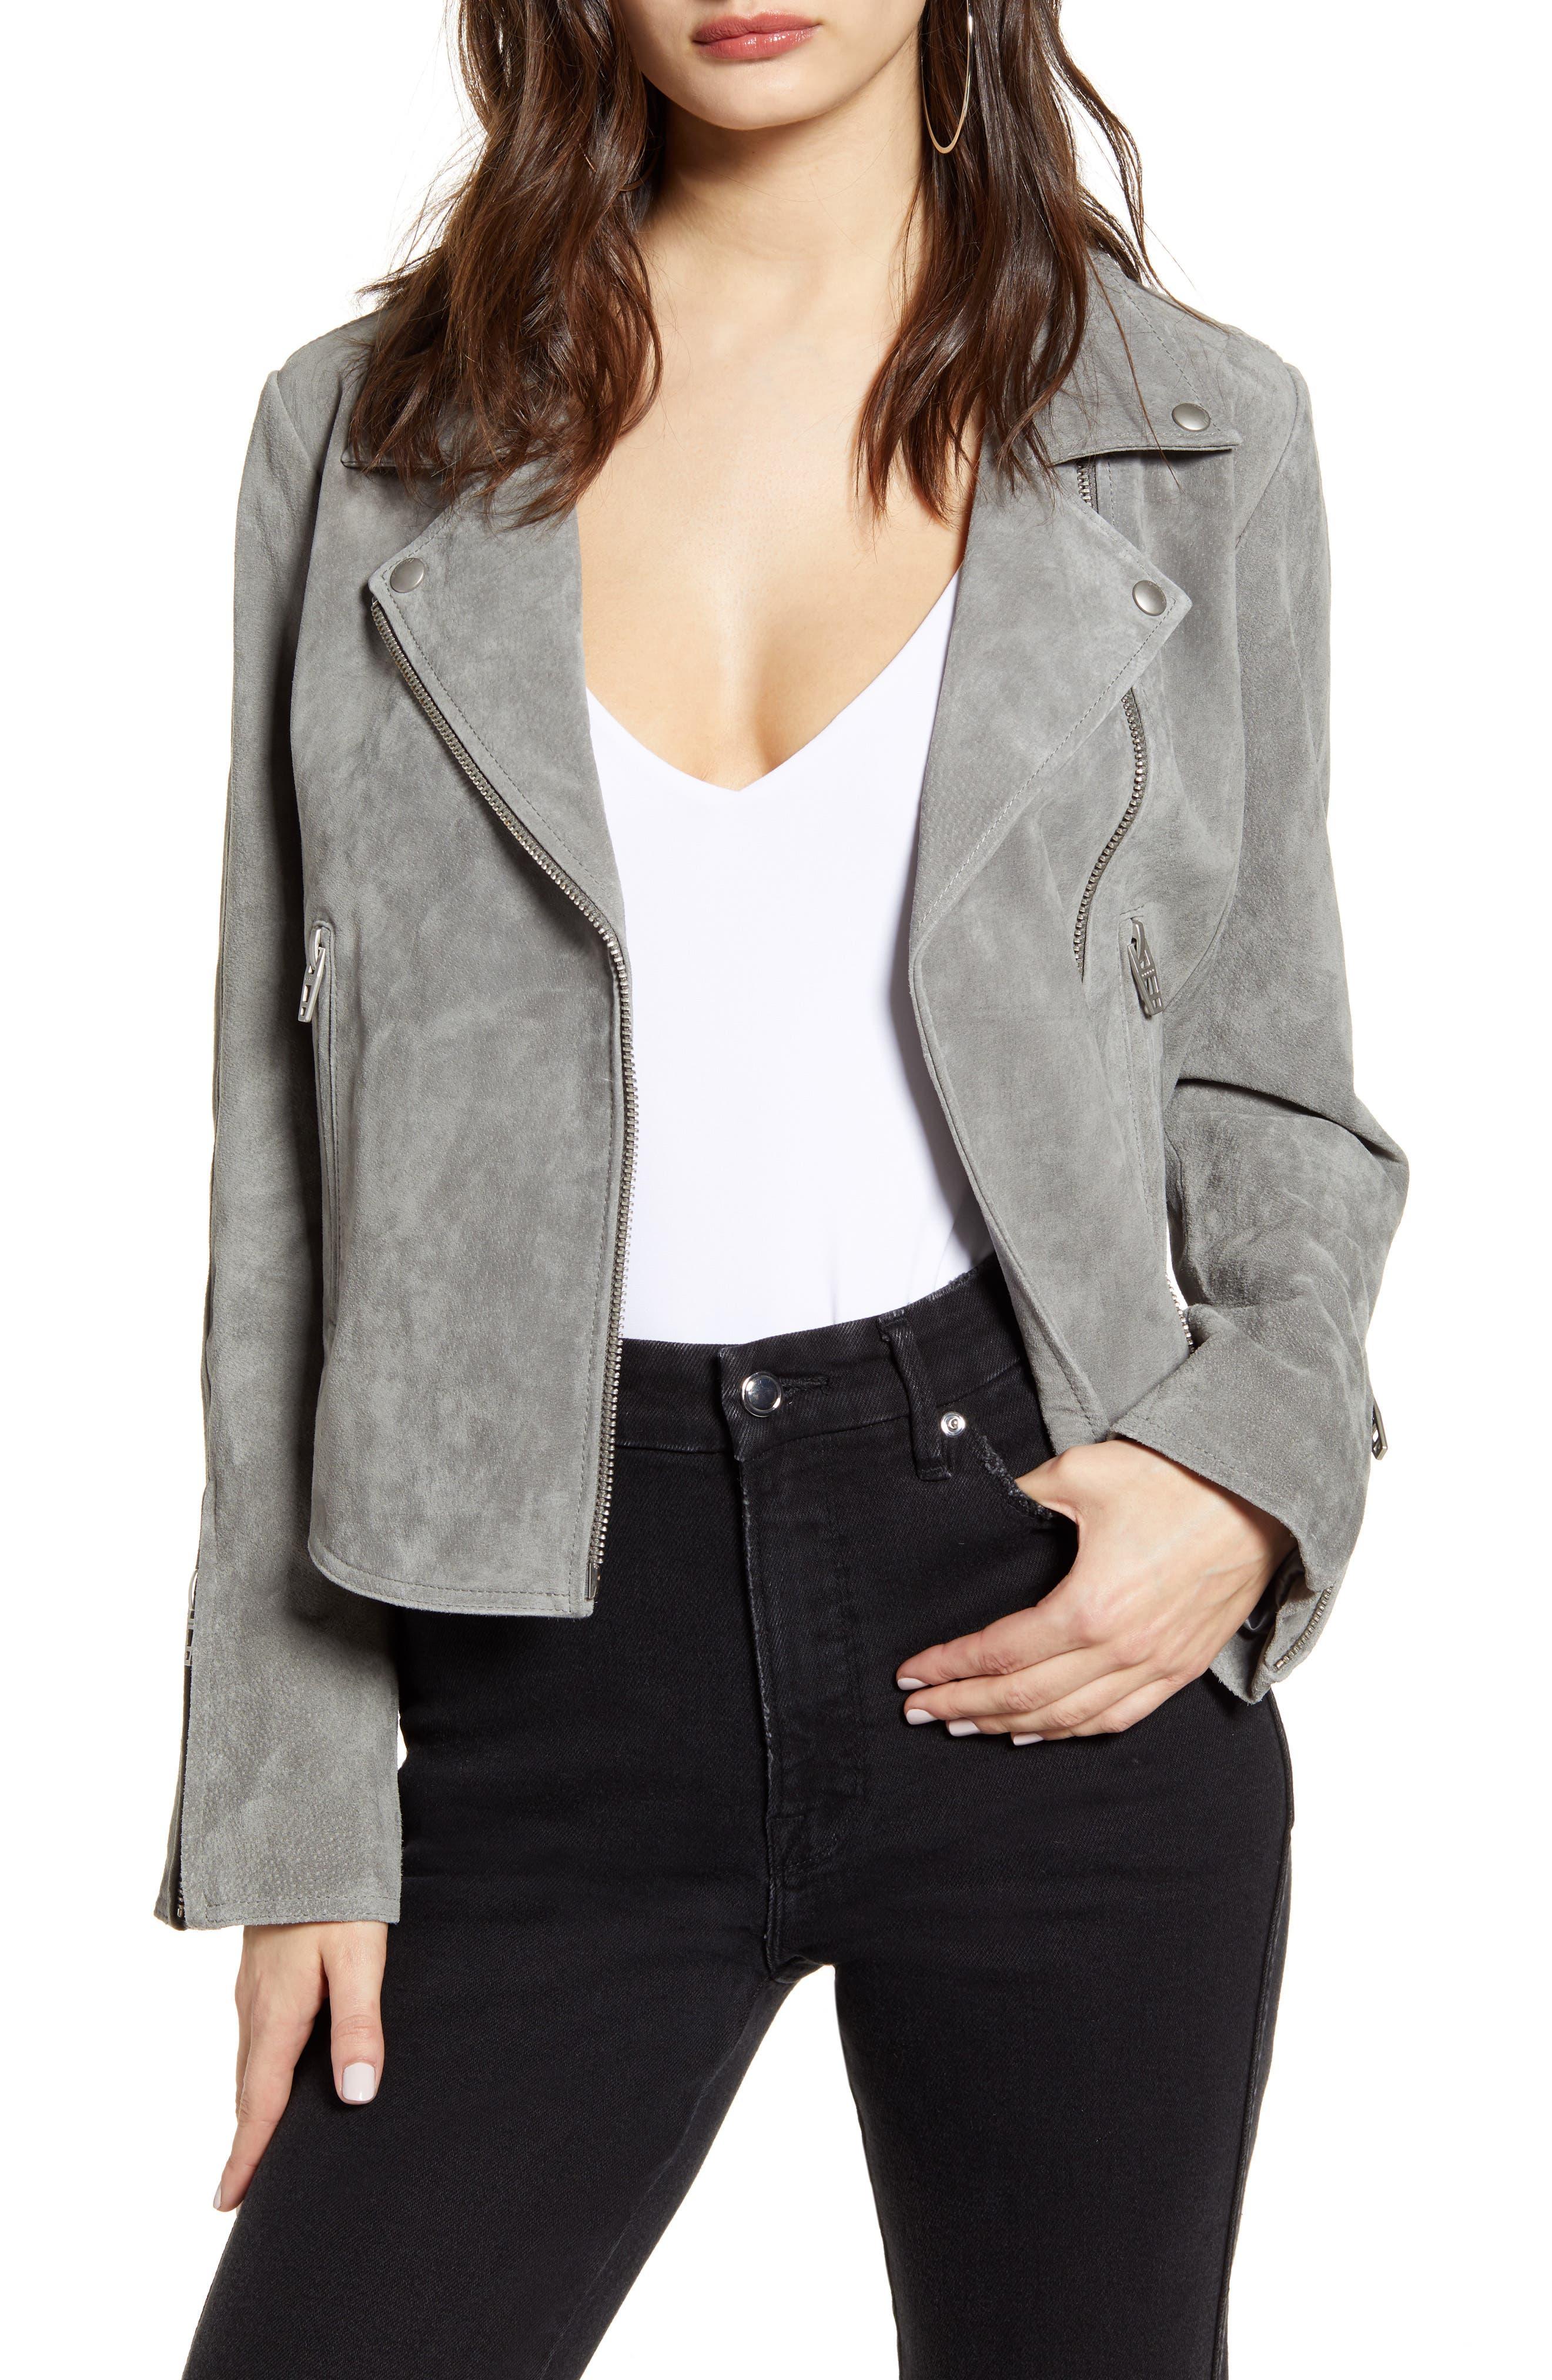 BLANKNYC Next Level Suede Moto Jacket (Regular & Plus Size)